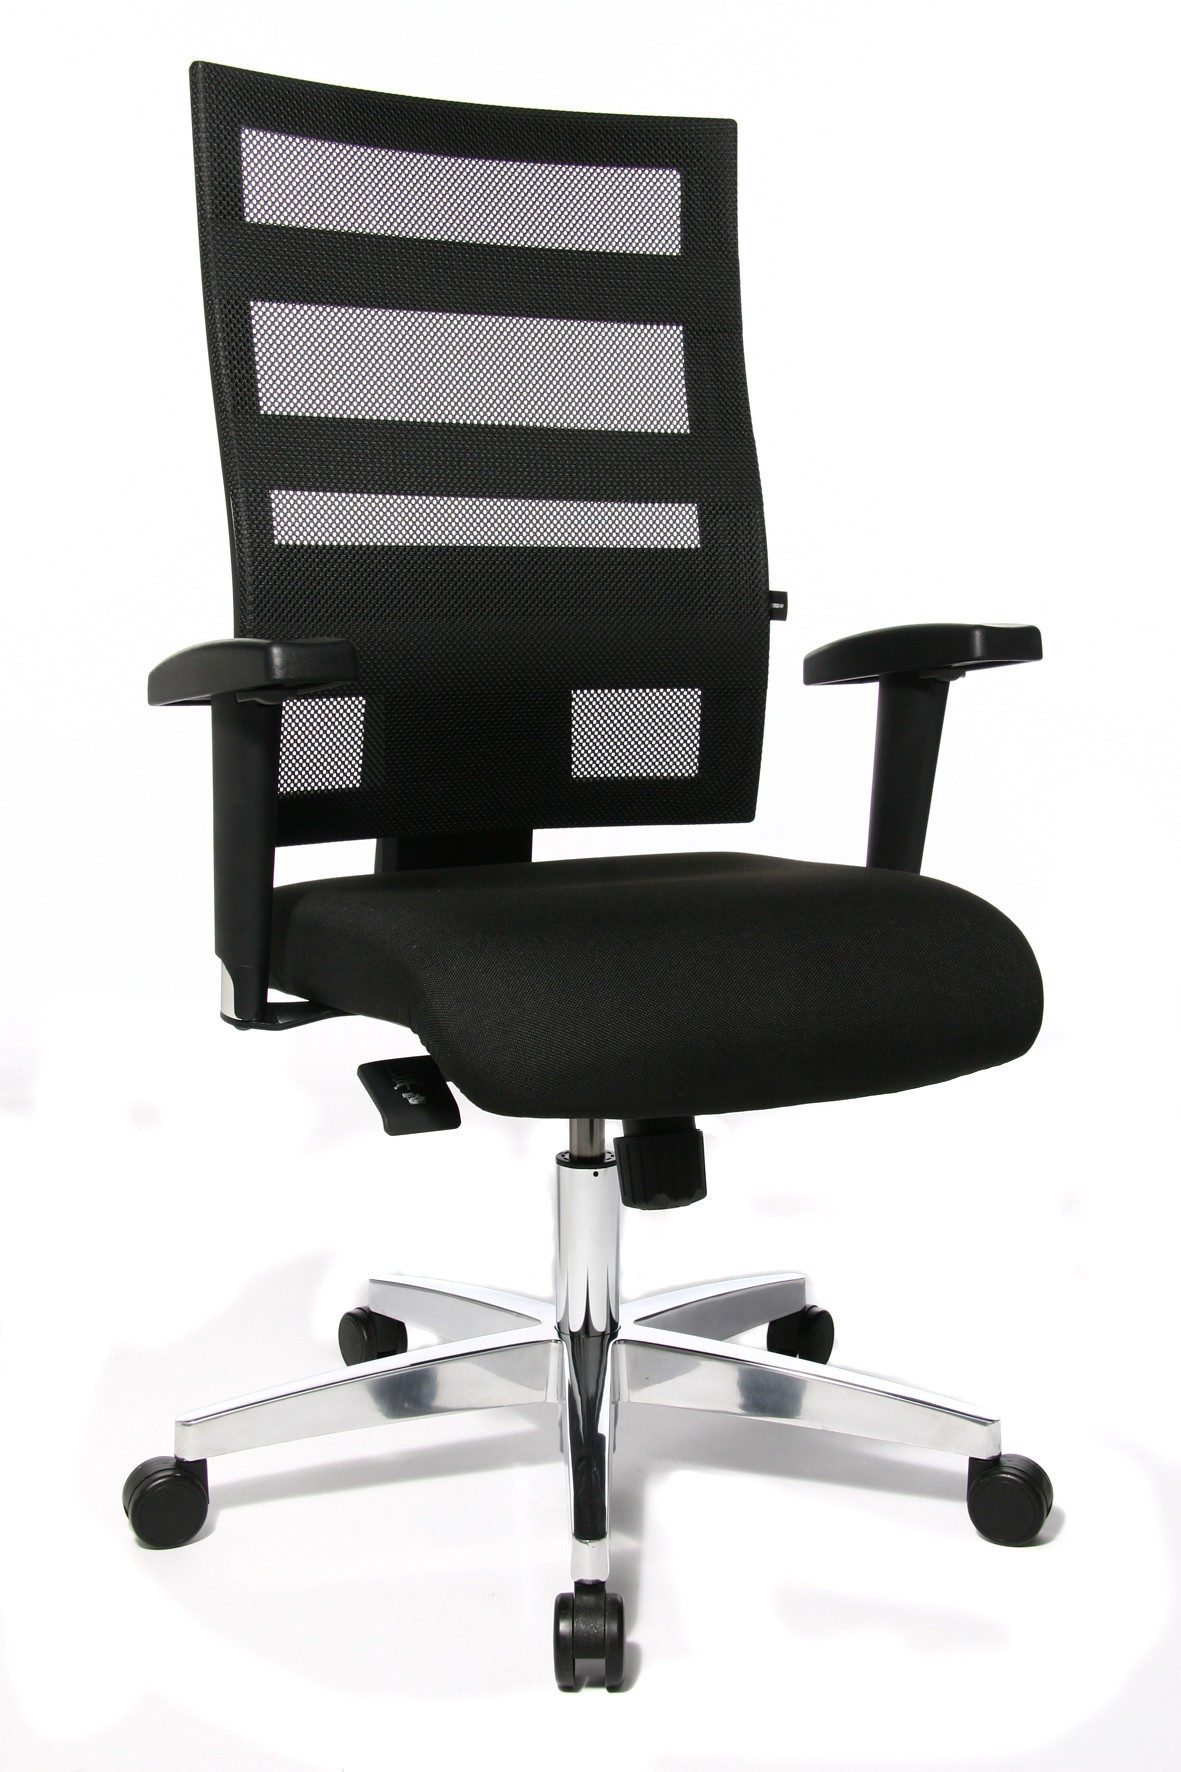 Drehstuhl Orthosedis 50 Als Bürostuhl Mit Sitzkomfort Schwarzer